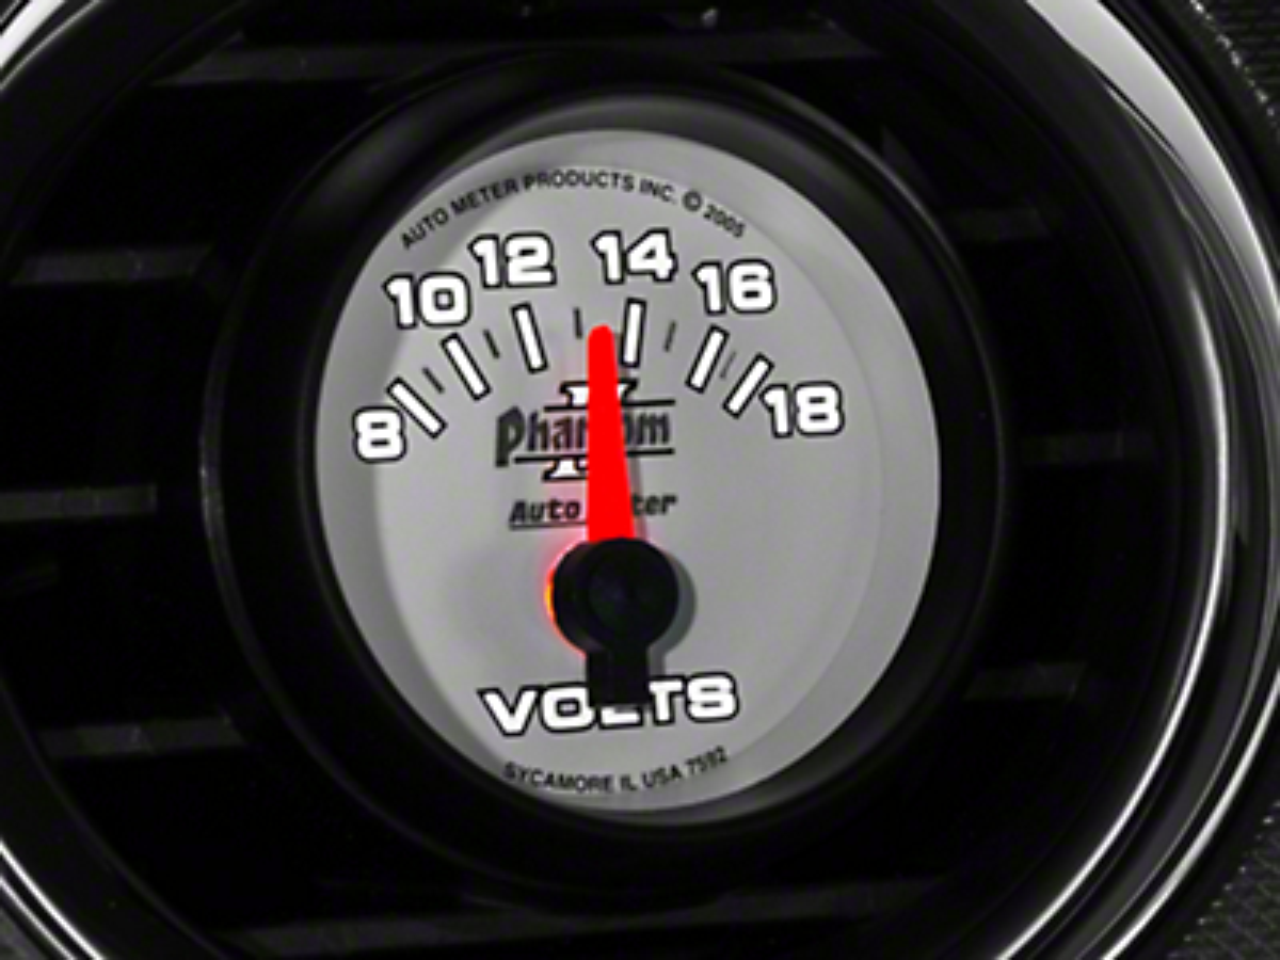 Auto Meter Phantom II Voltmeter Gauge - Electric (79-17 All)